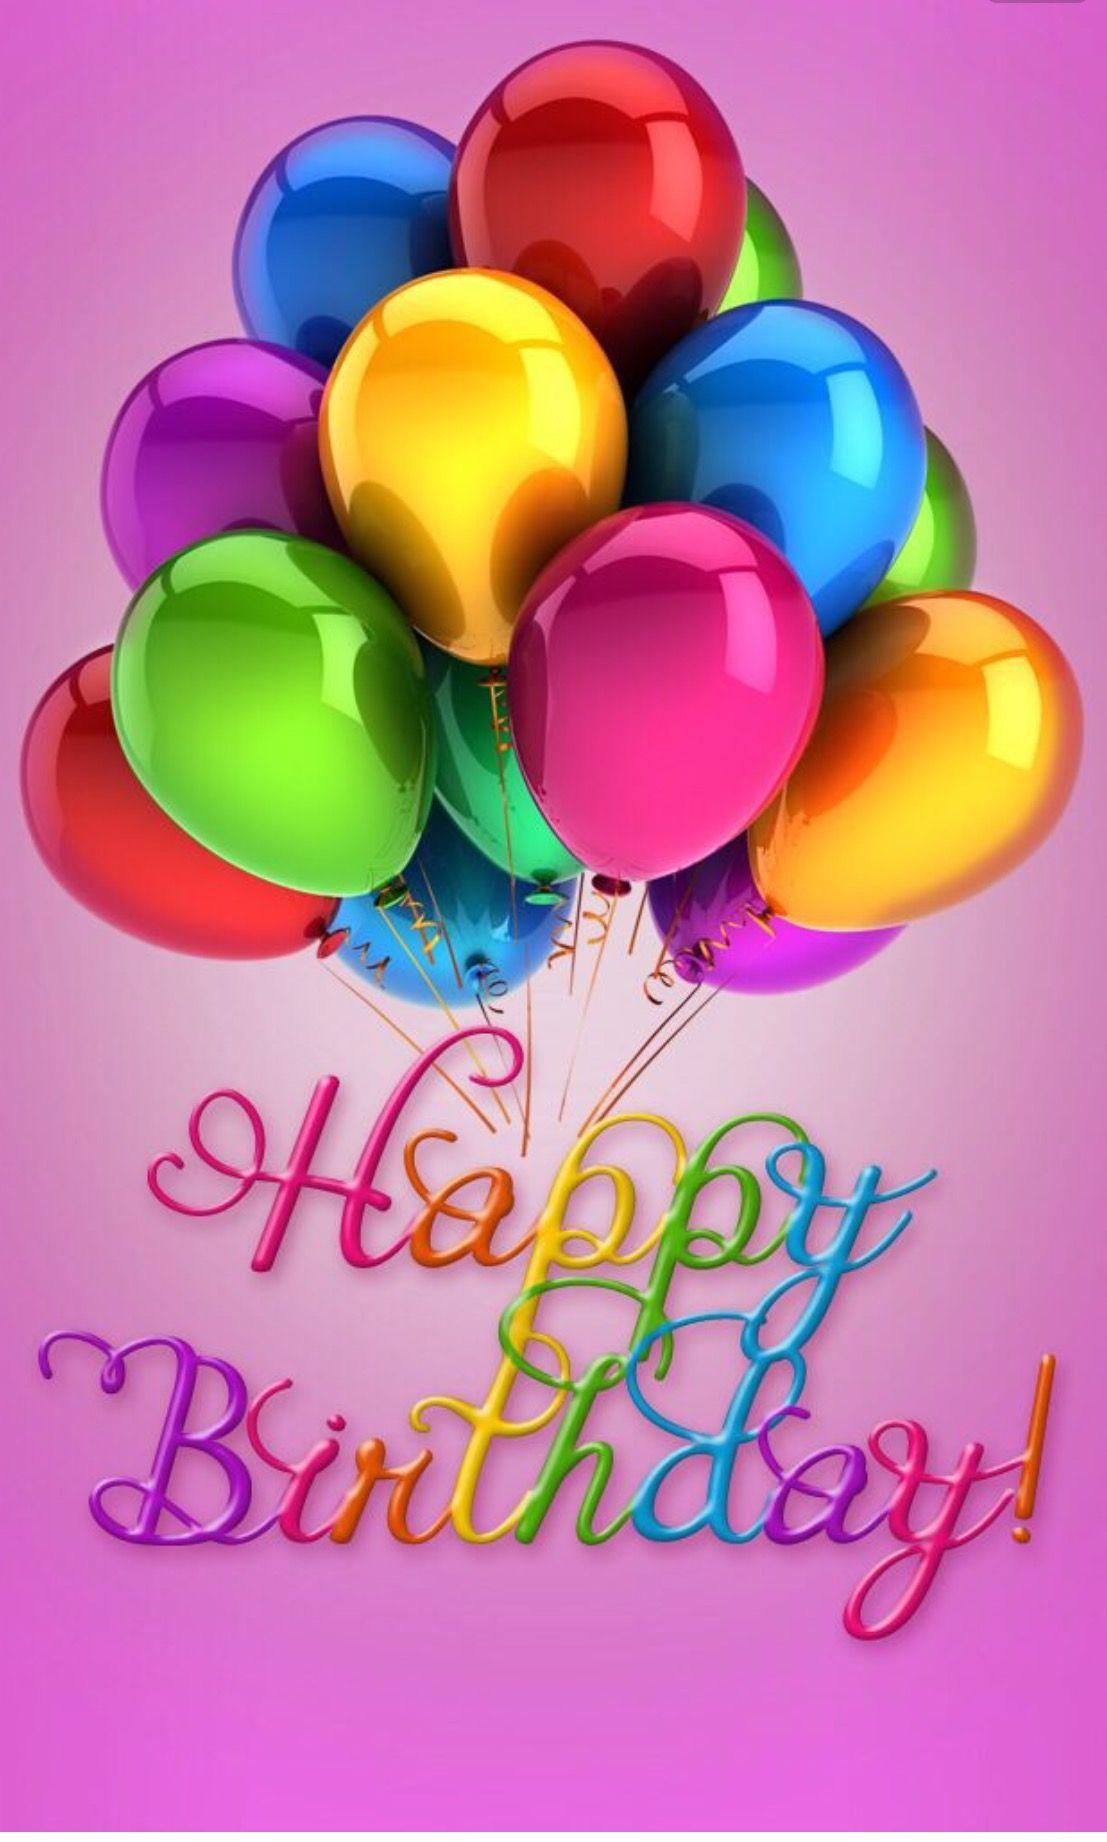 Pin by Connie Billian on Birthday FB Happy birthday fun